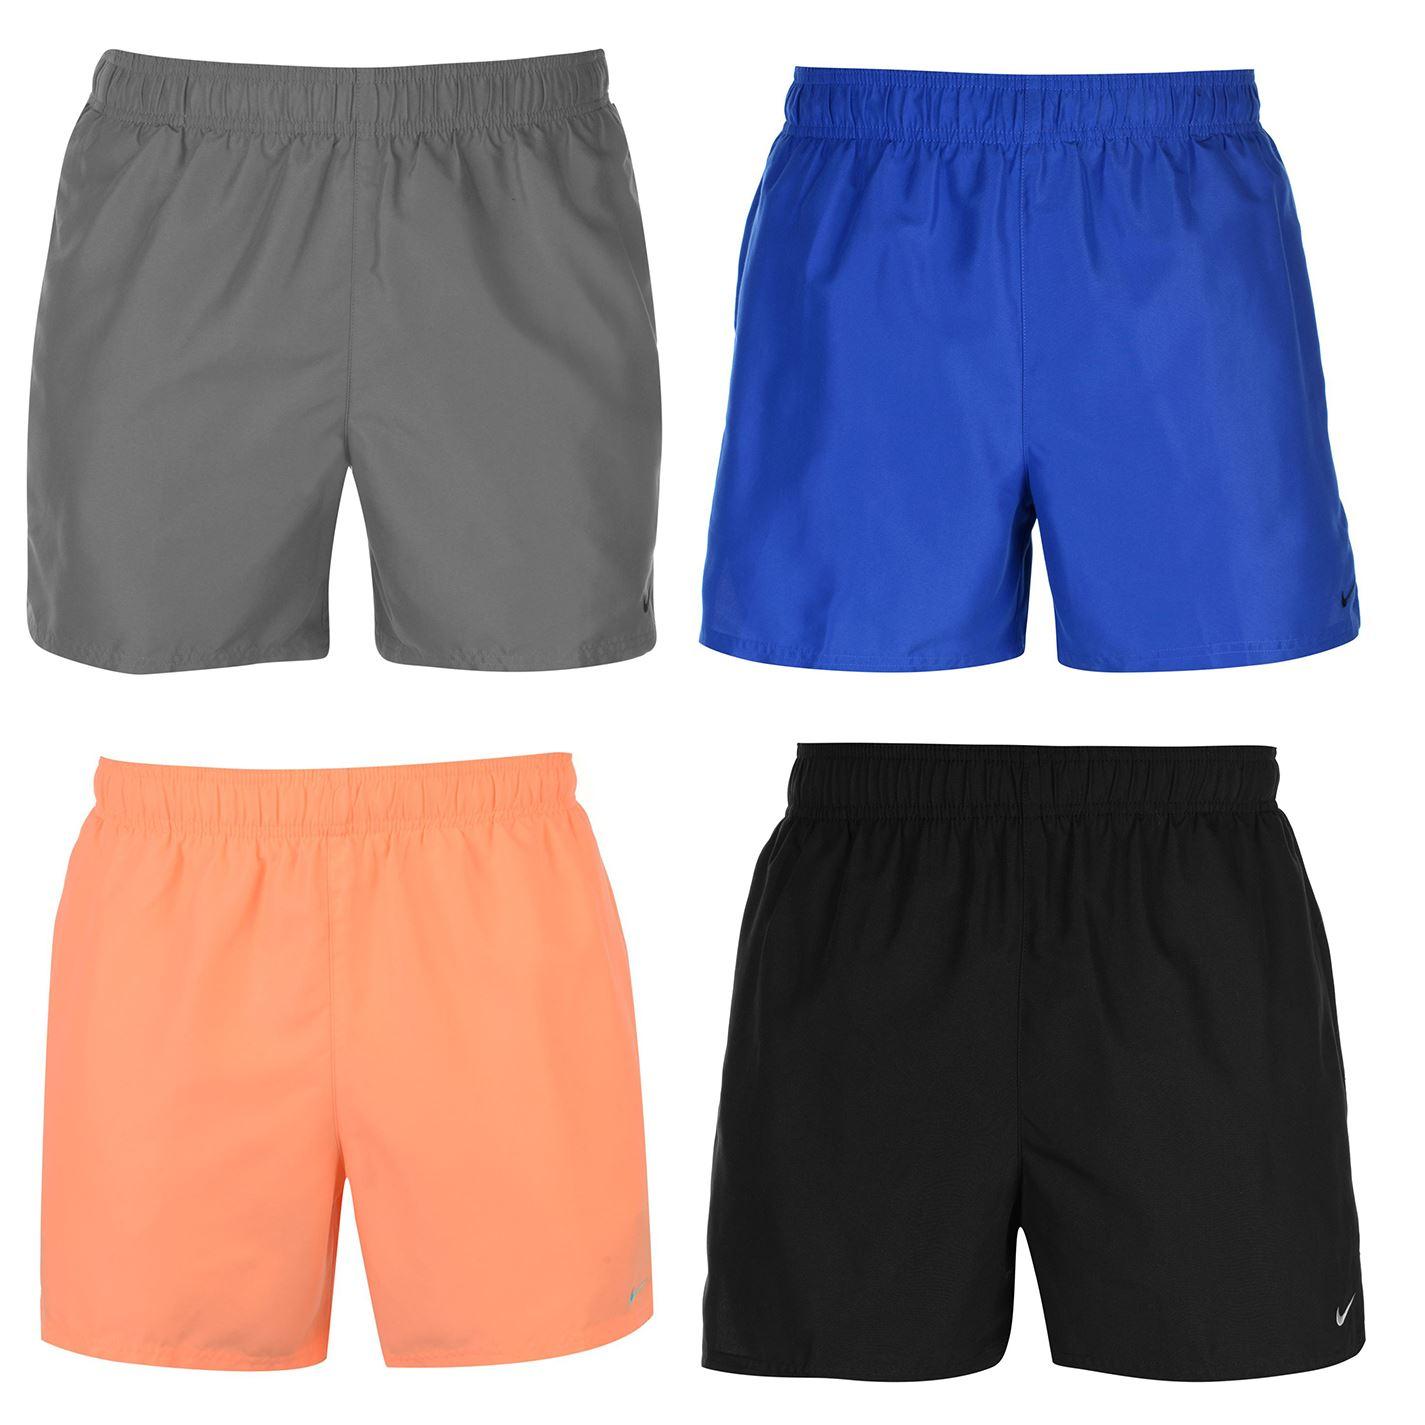 Pertenece Socialismo Tractor  Nike Core Swim Shorts Mens Bottoms Swimwear Beachwear Small Black | eBay